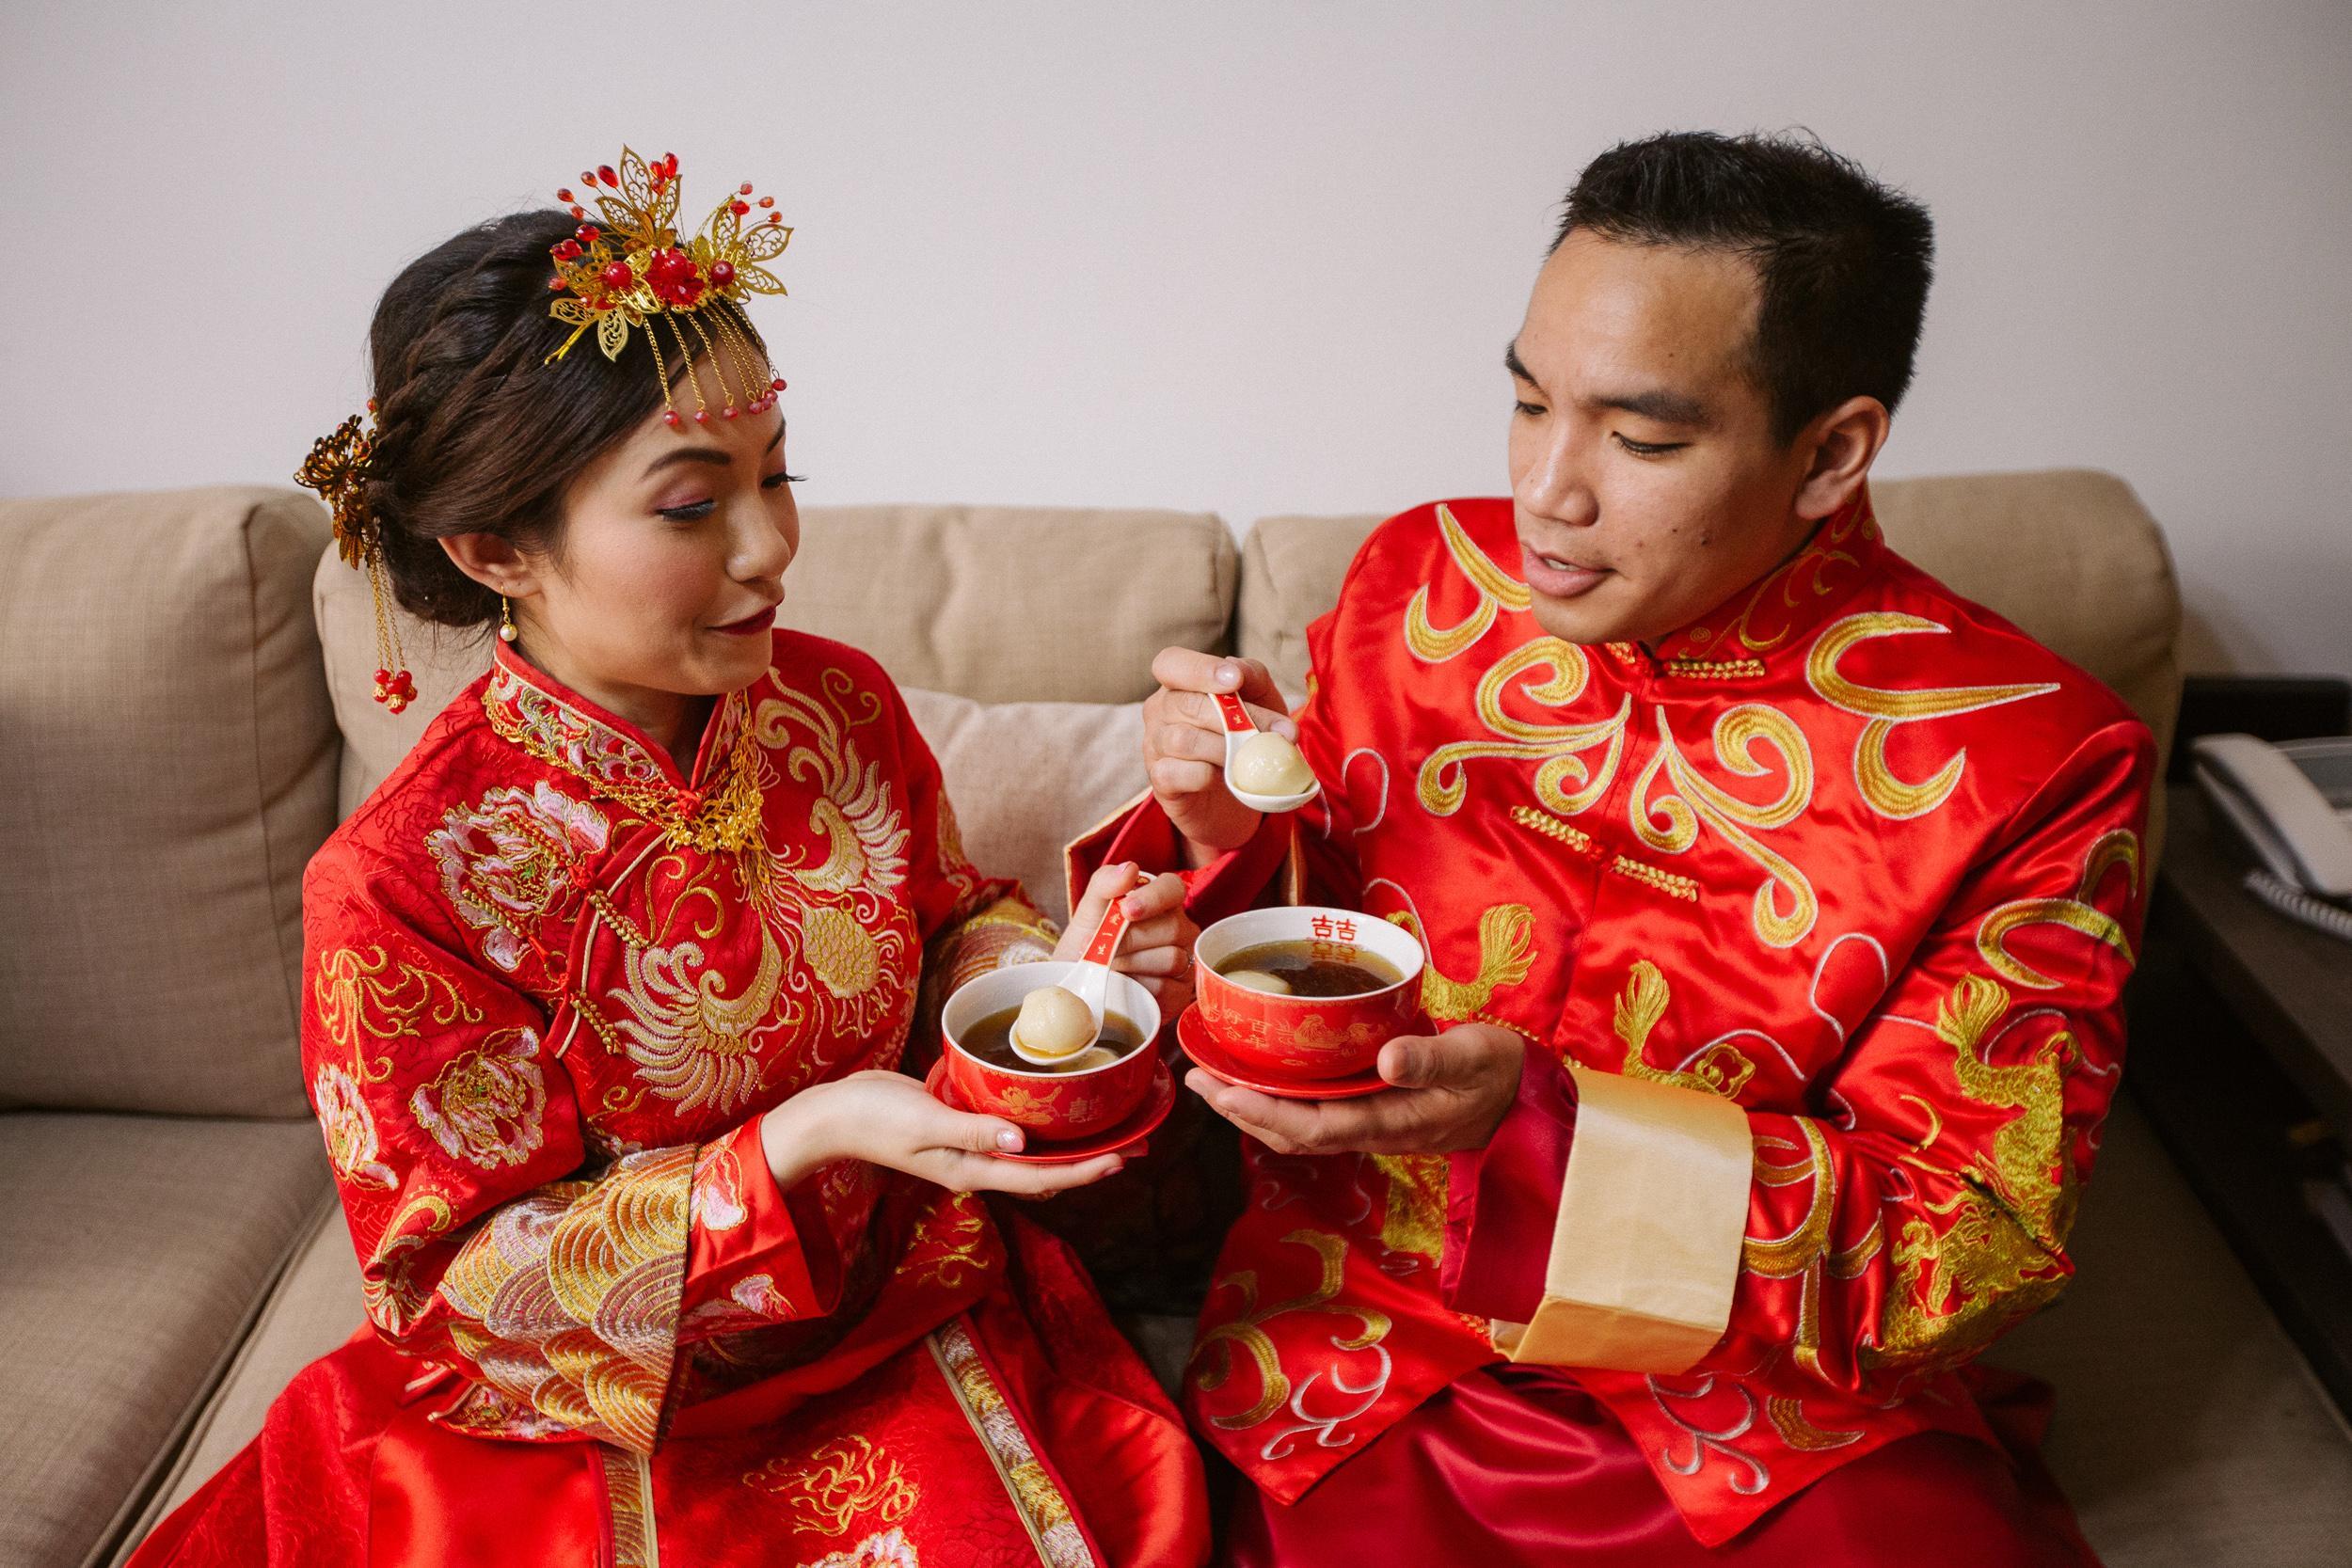 singapore-wedding-photographer-cheryl-matthew-fullerton-hotel-wedding-30.jpg